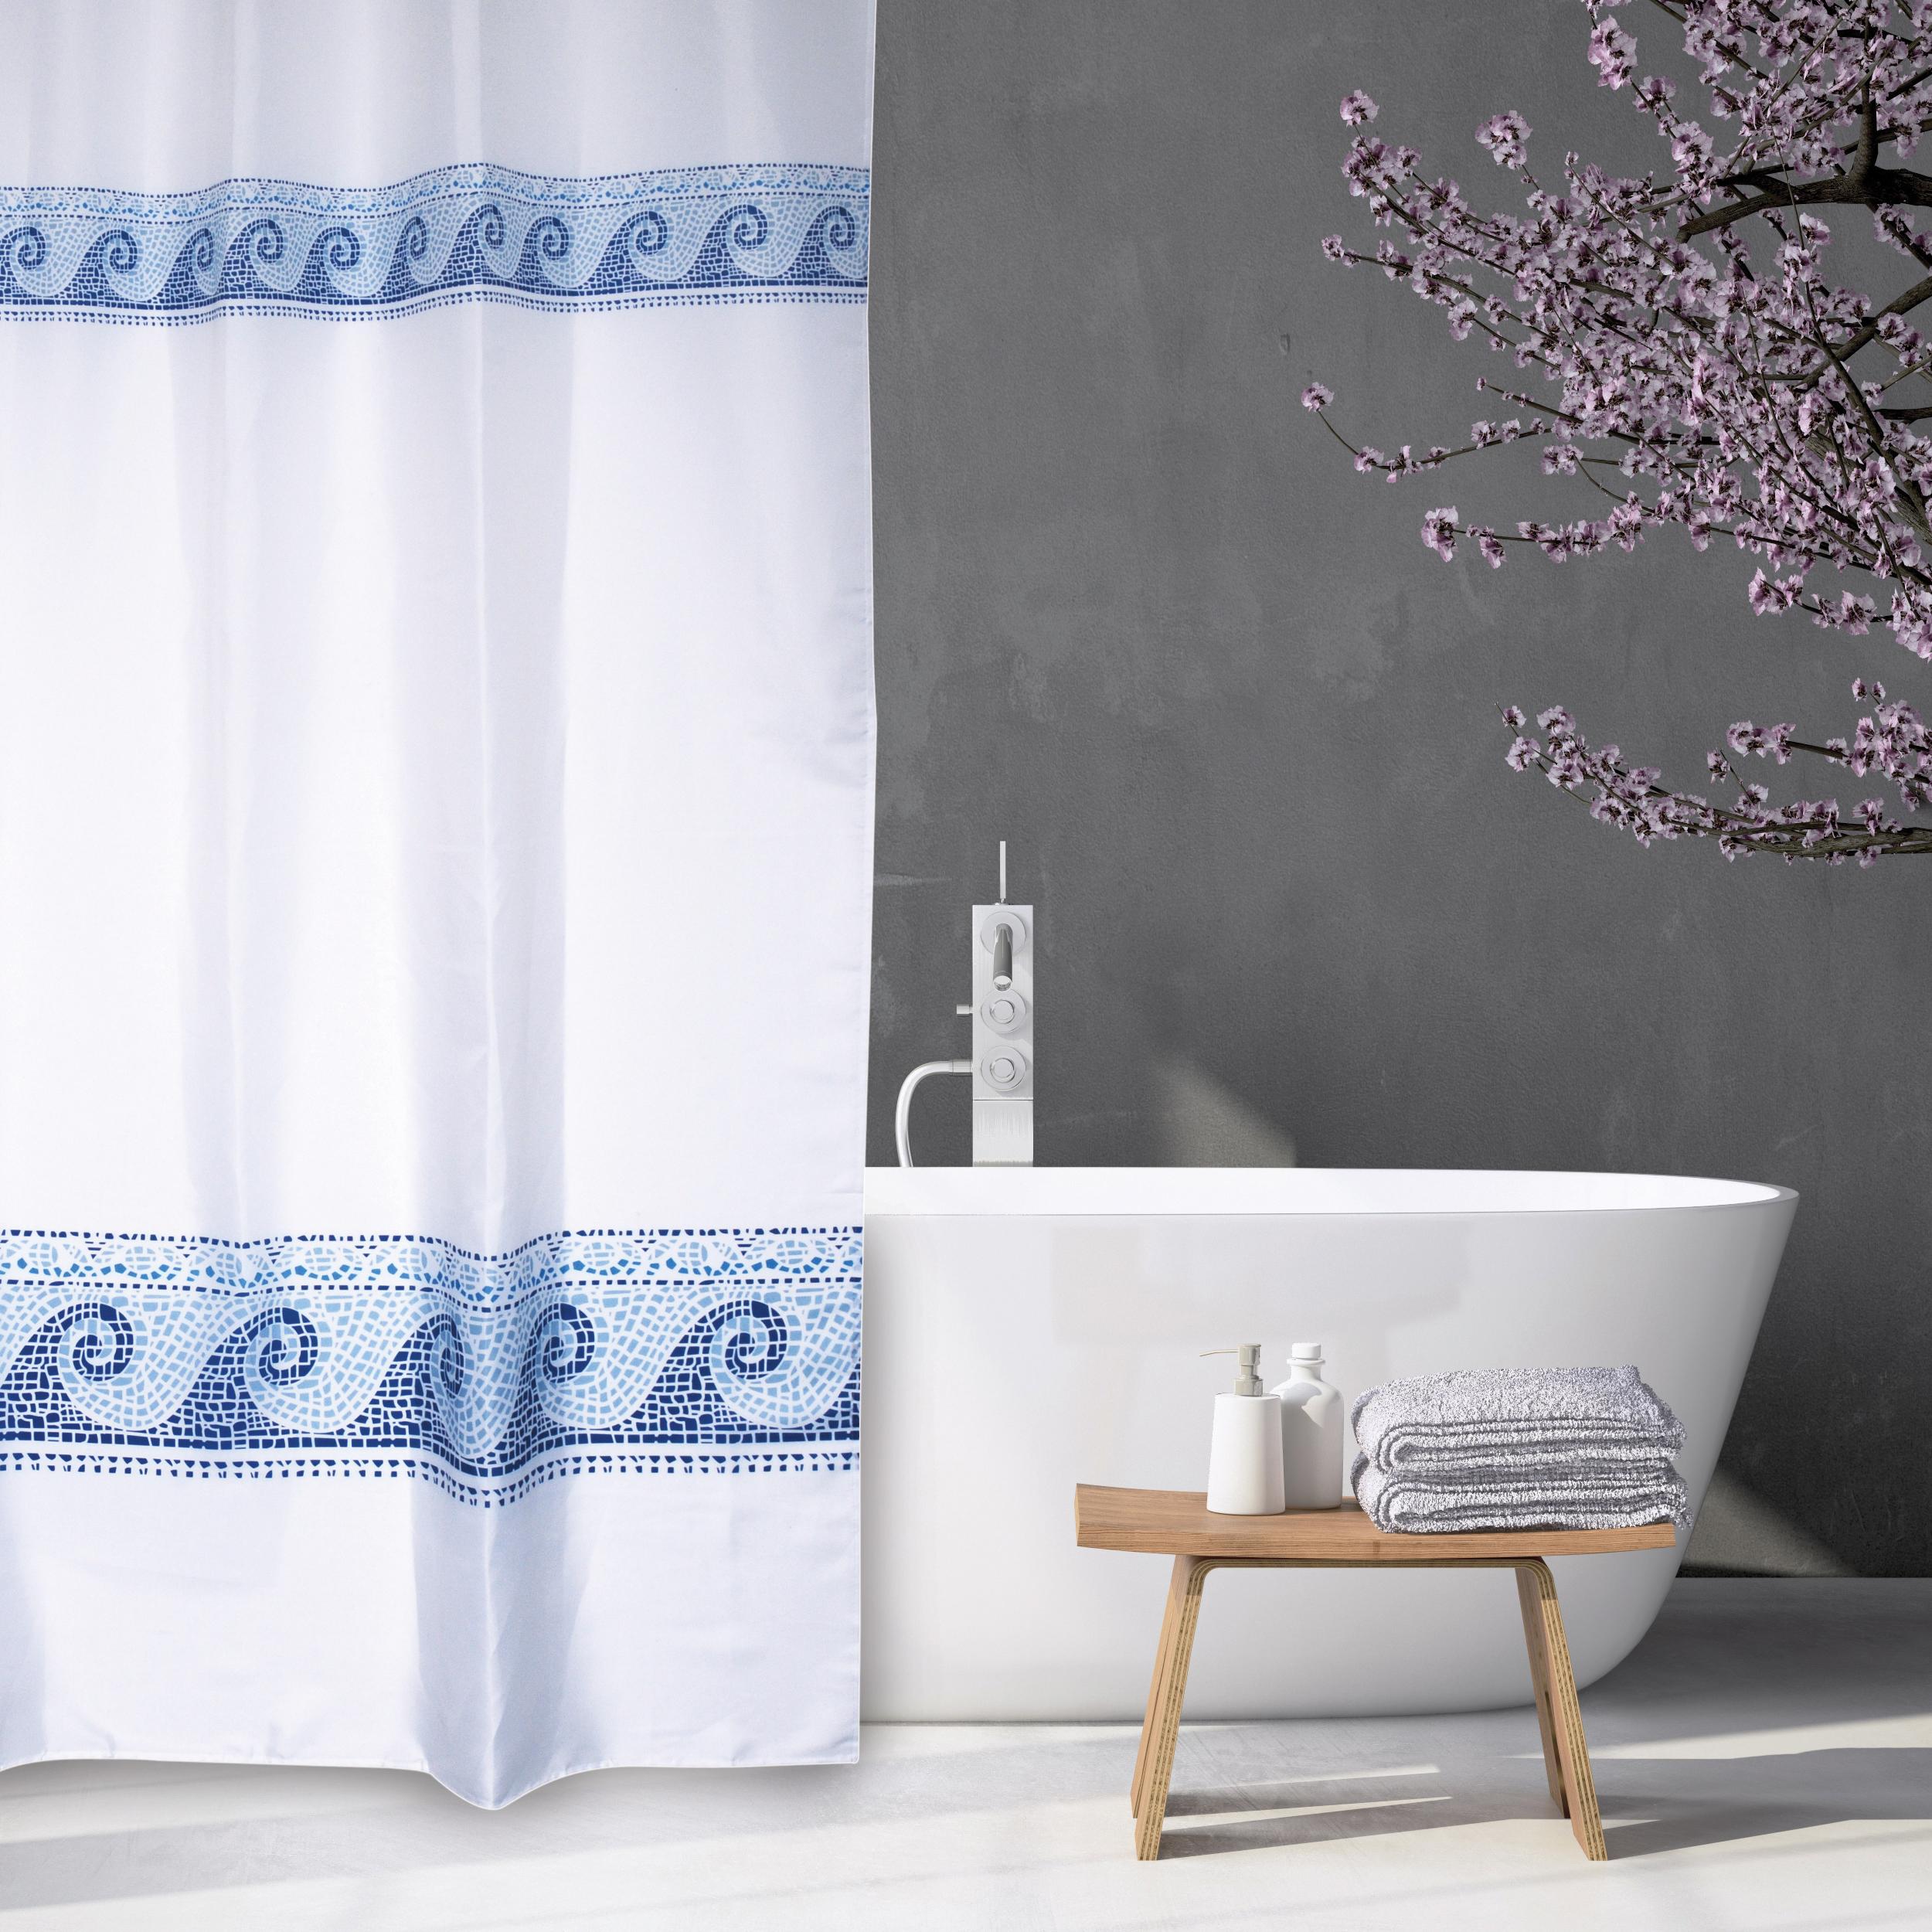 MSV Duschvorhang 180x200cm Anti Schimmel Textil Badewannenvorhang Wannenvorhang Wellen